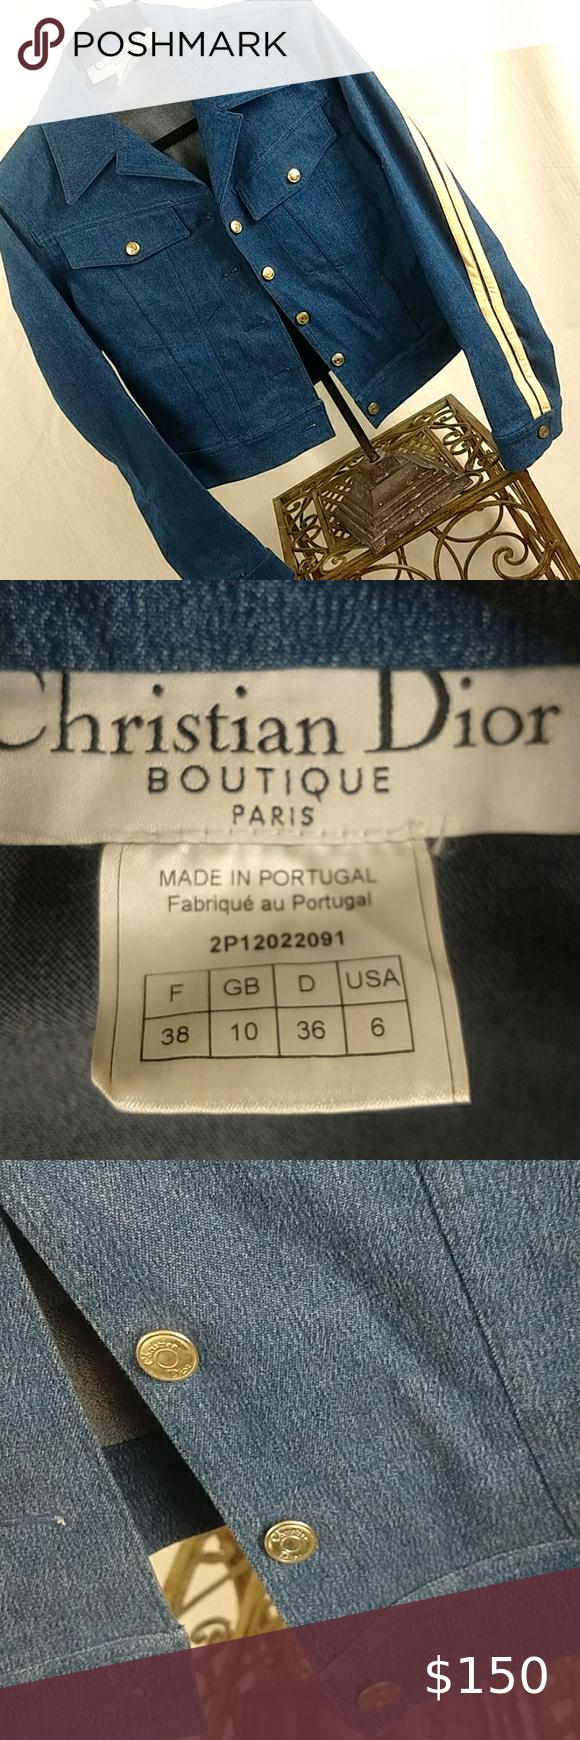 Vintage Christian Dior Denim Jacket Denim Jacket Christian Dior Dior Jacket [ 1740 x 580 Pixel ]